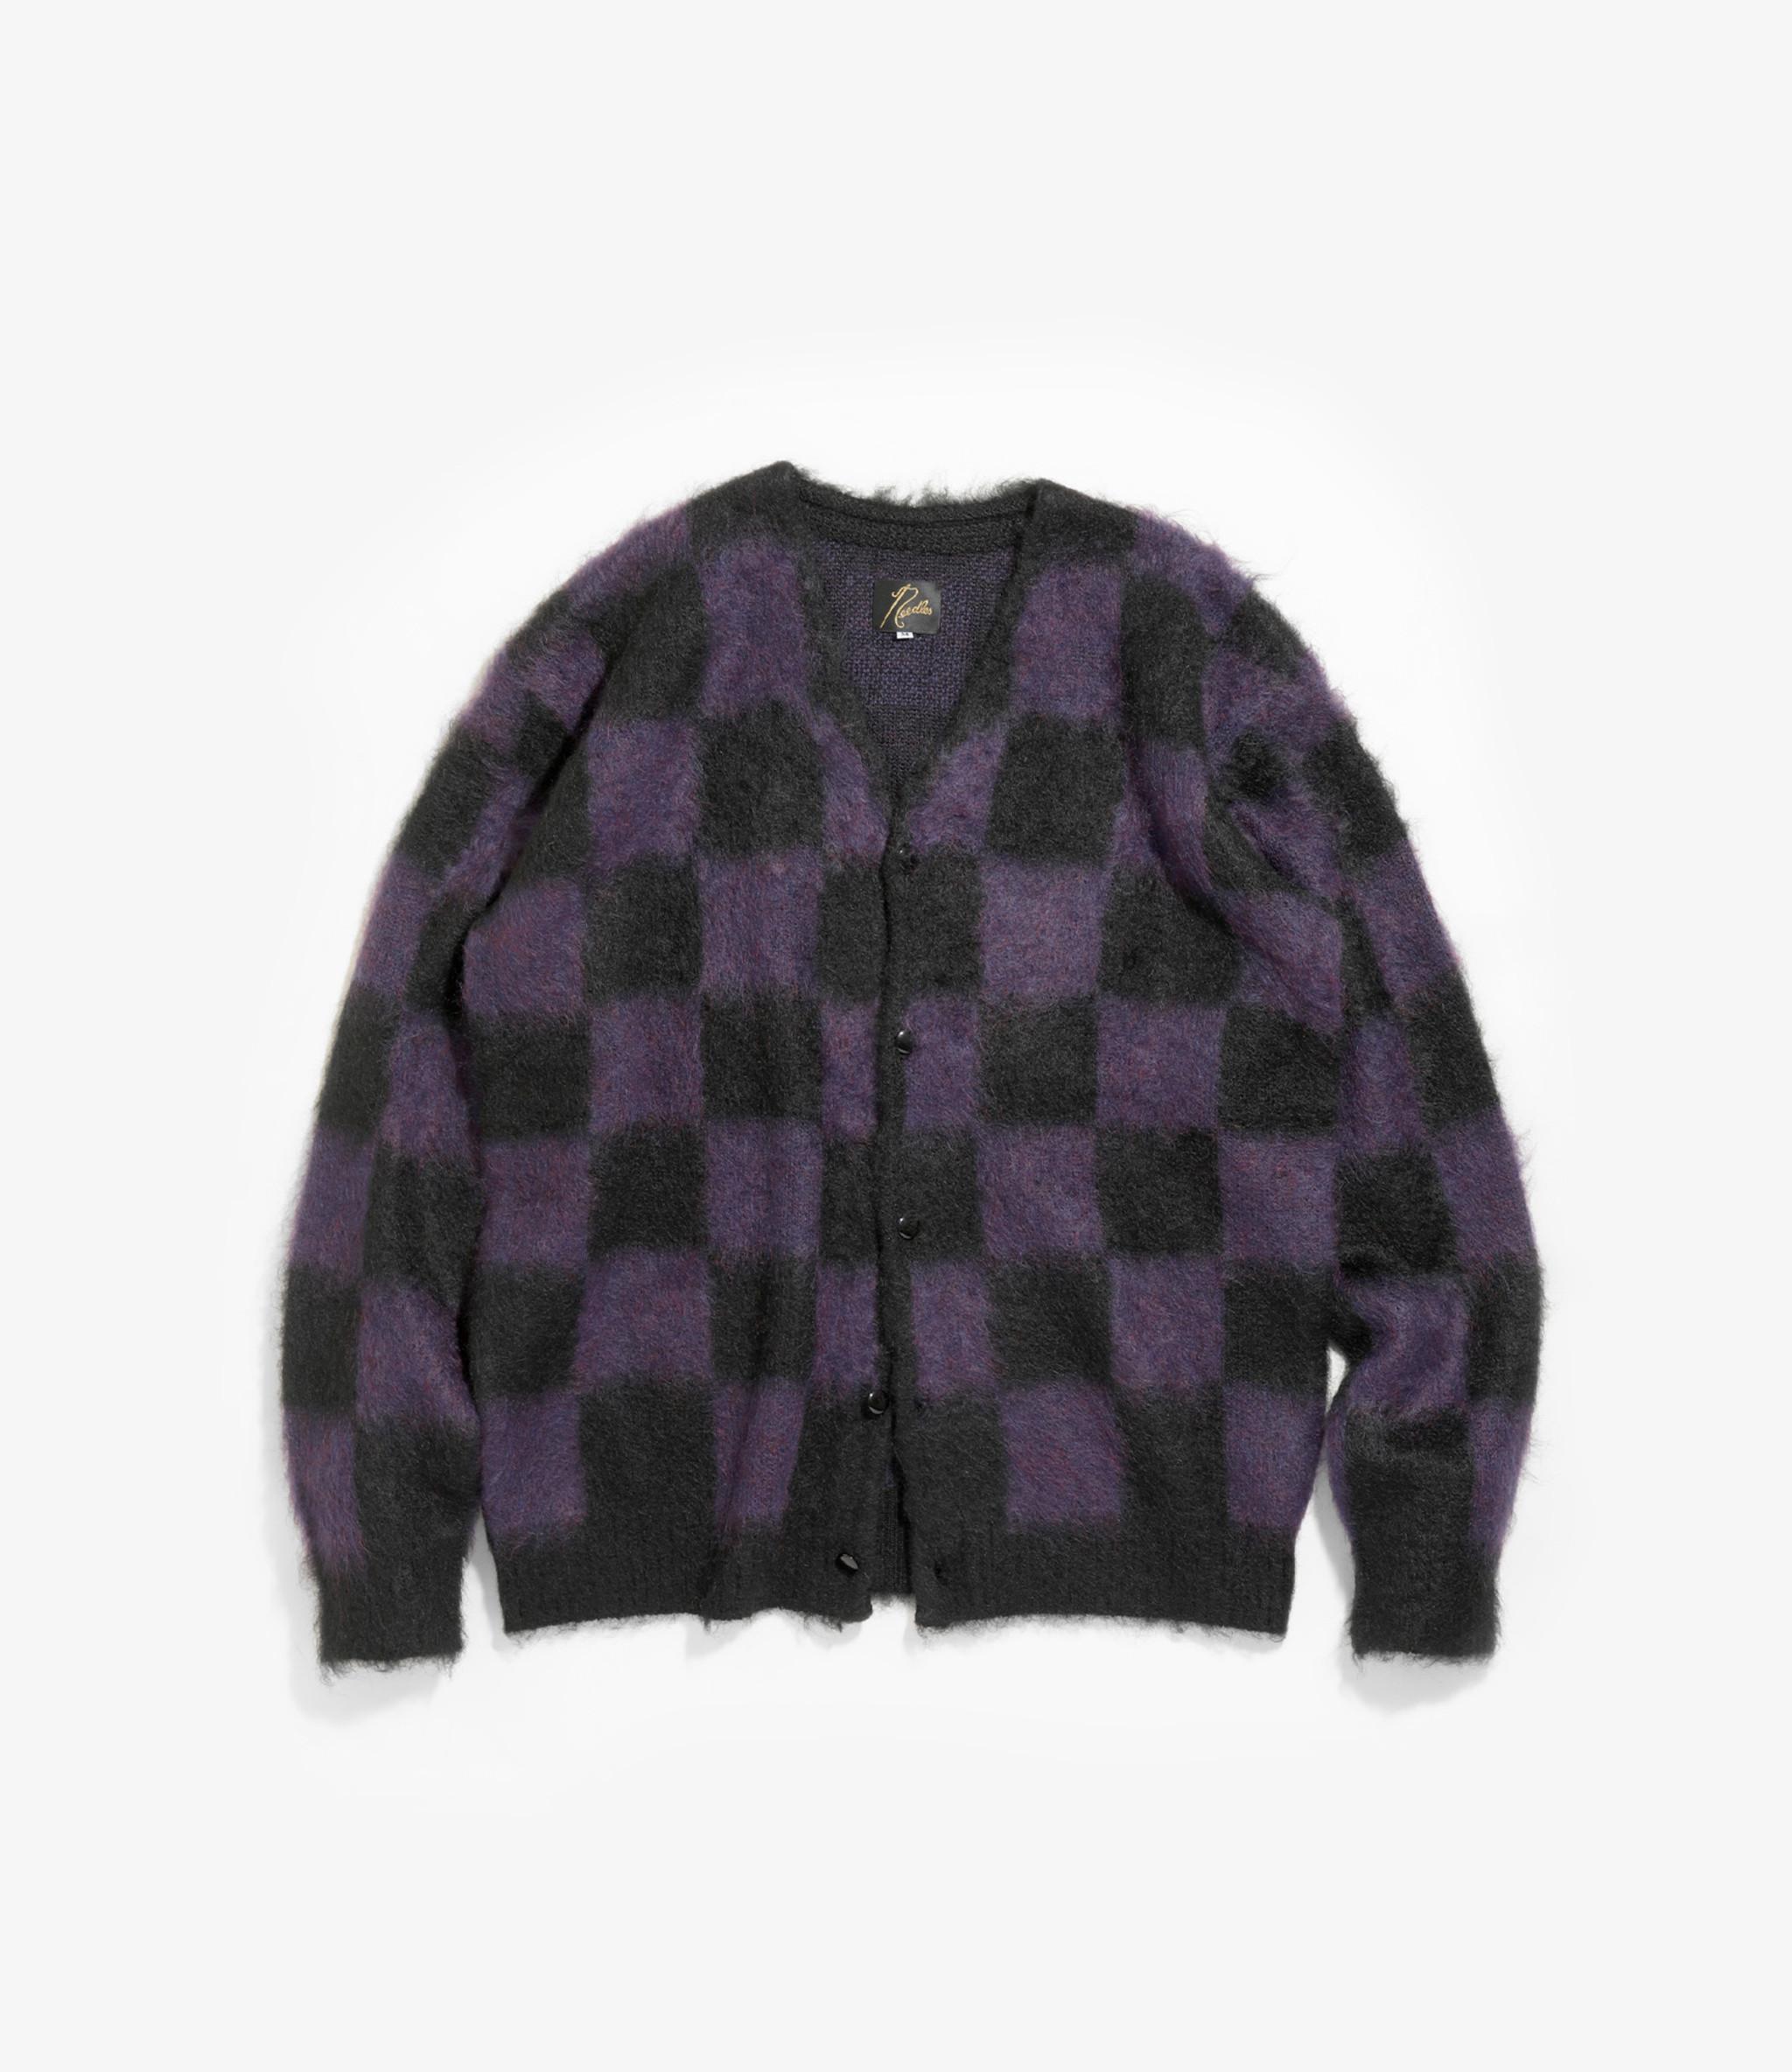 Needles Mohair Cardigan - Checkered - Black/Purple